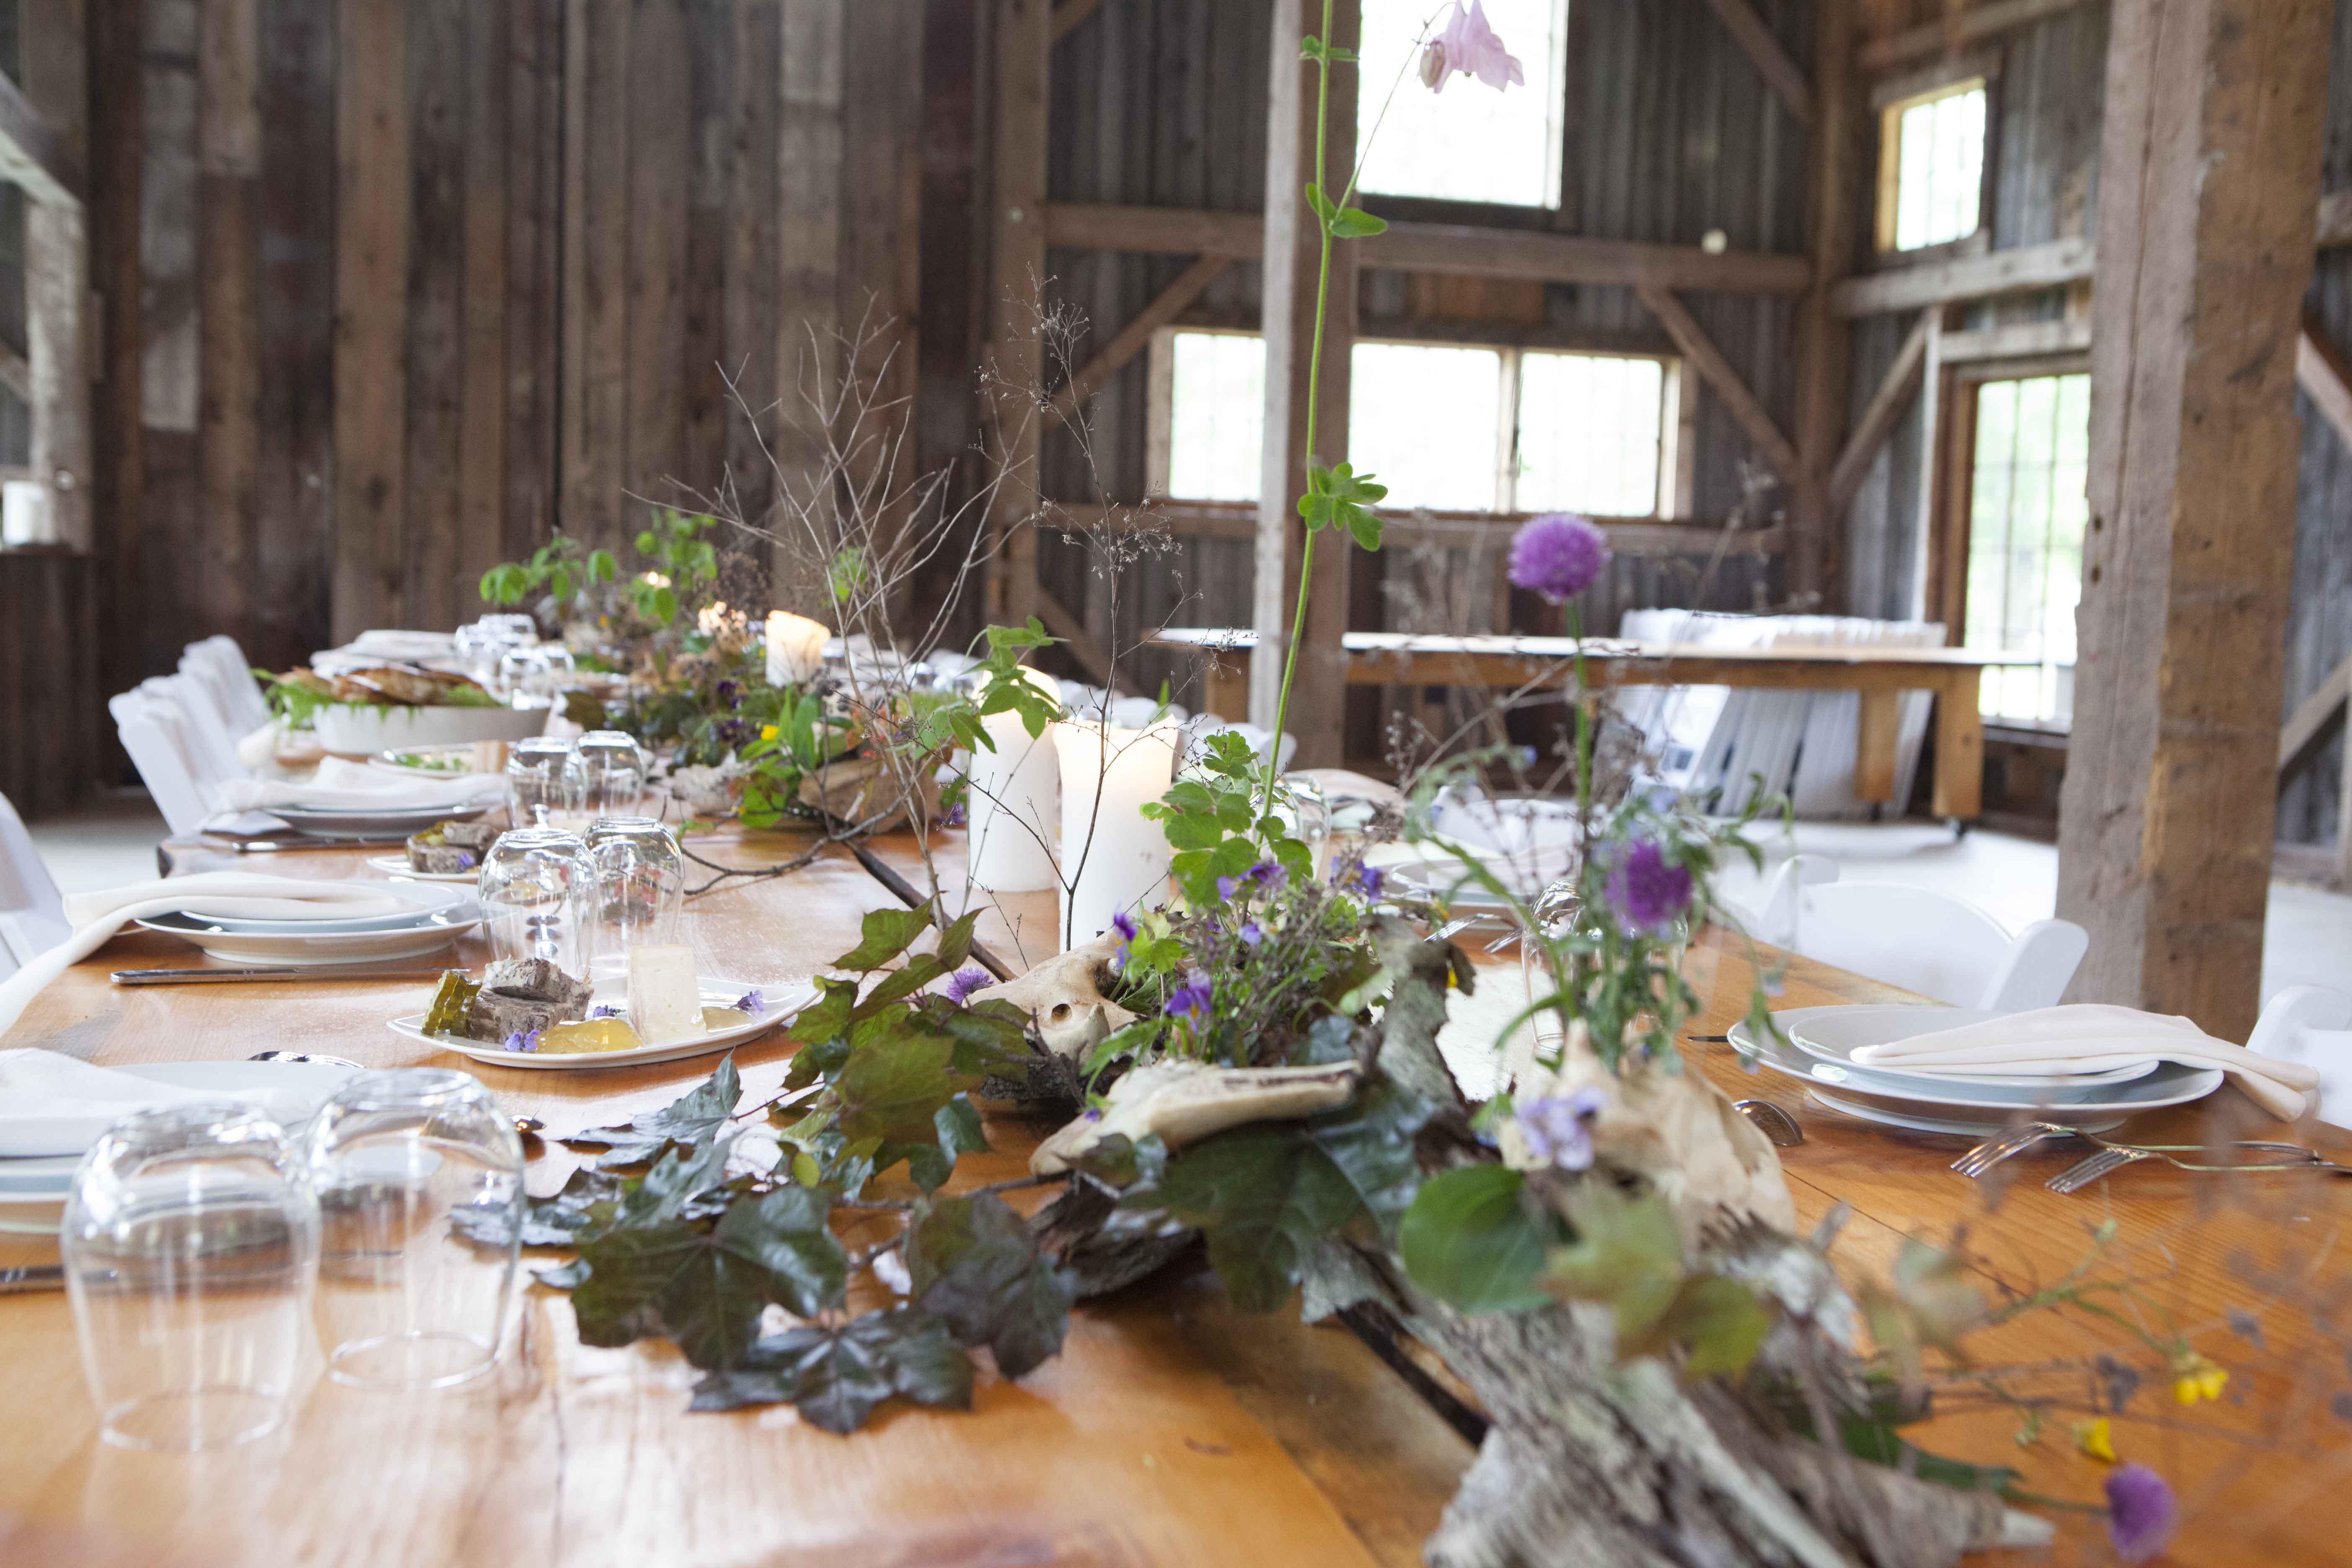 Family Farm Dinner event